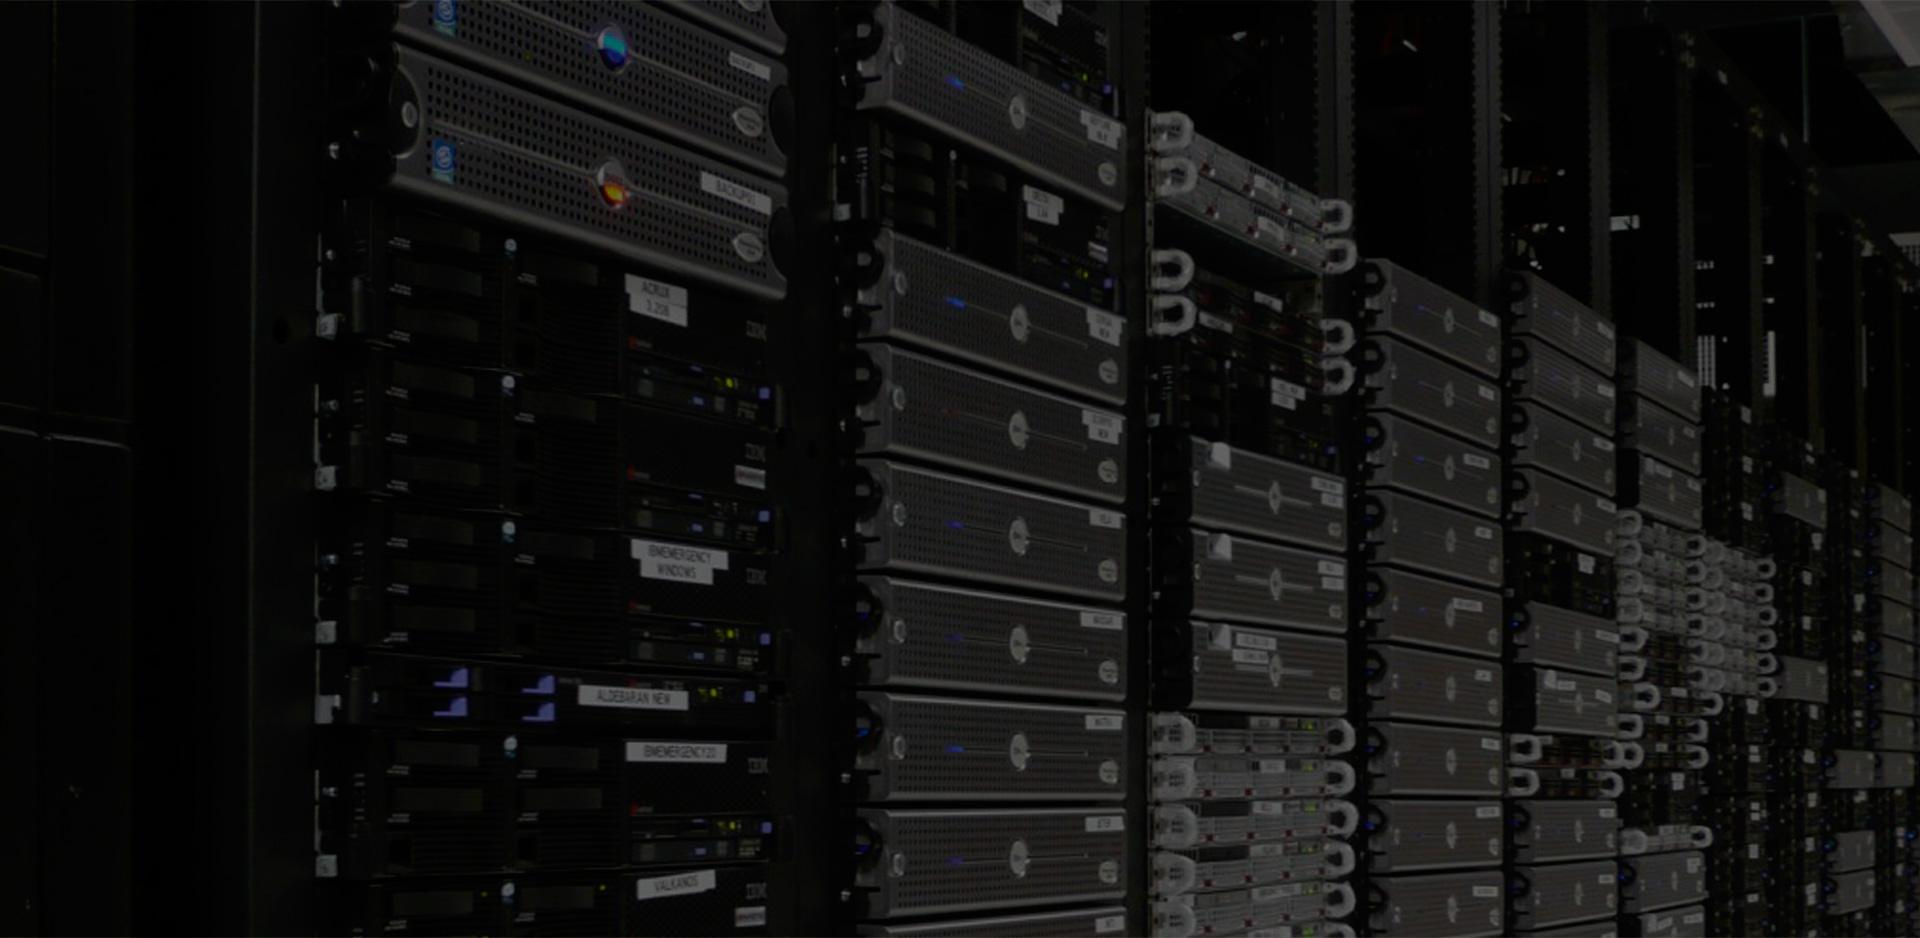 купить vds сервер майнкрафт